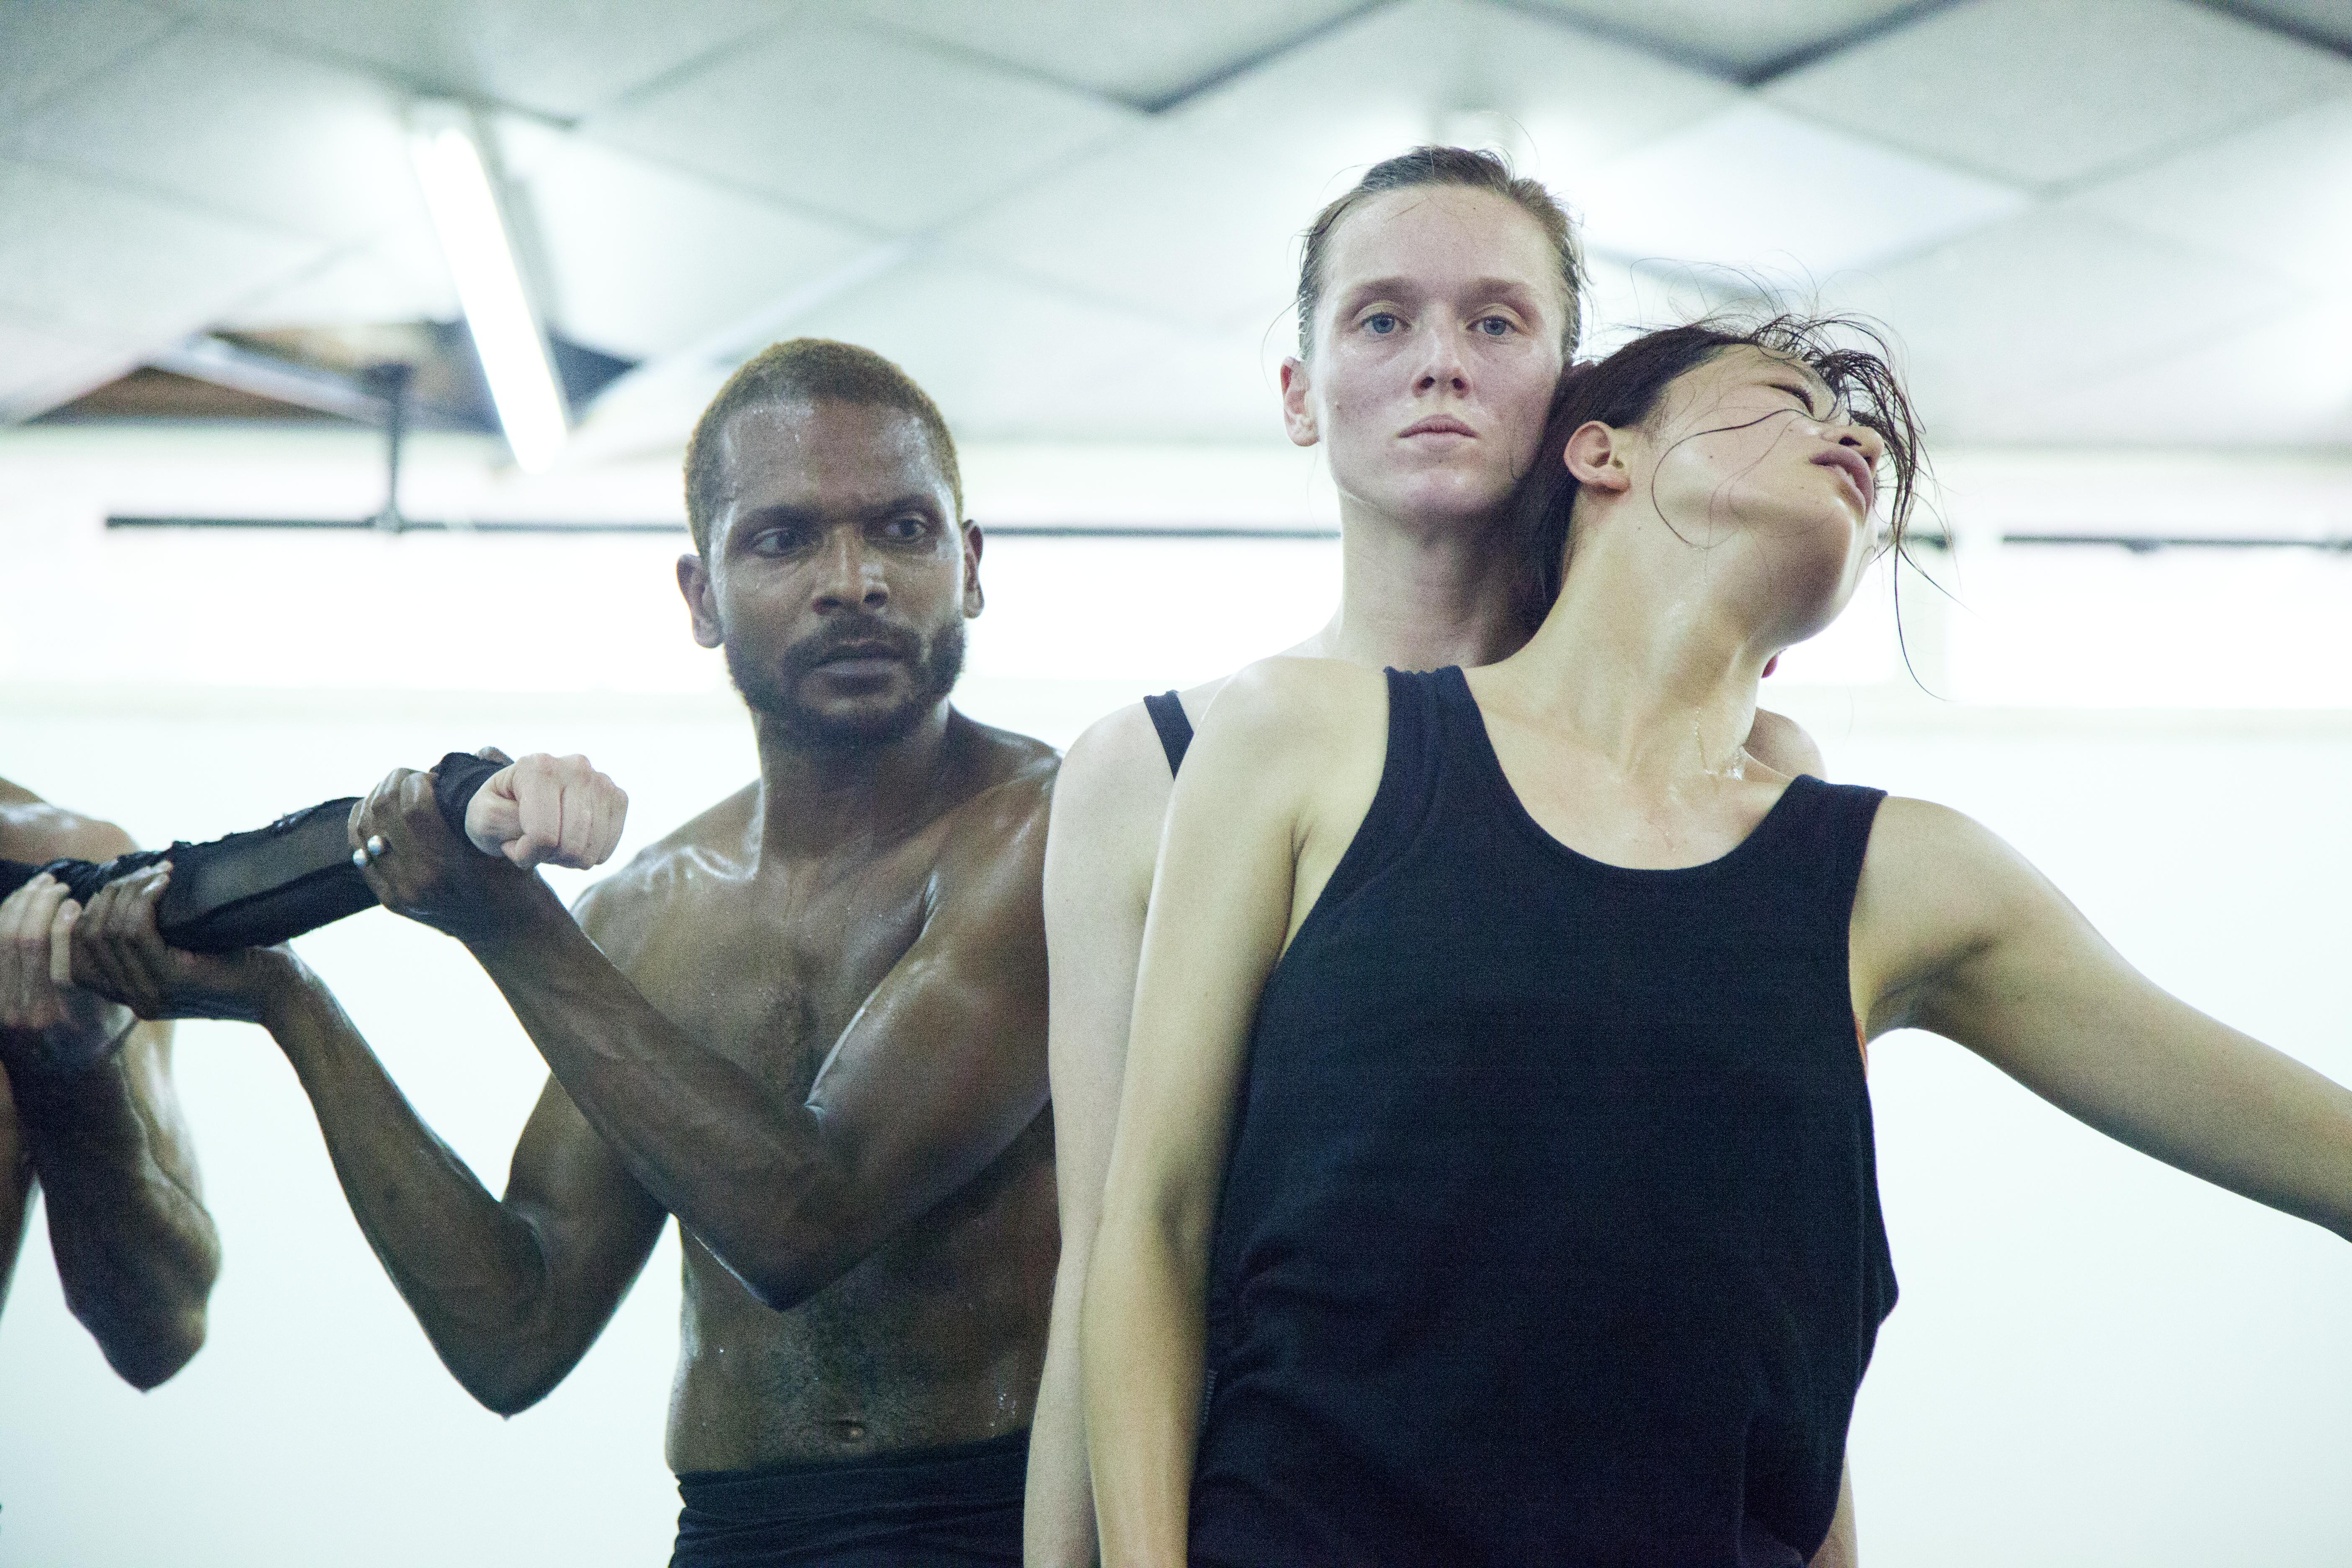 L-E-V Sharon Eyal & Gai Behar dance company